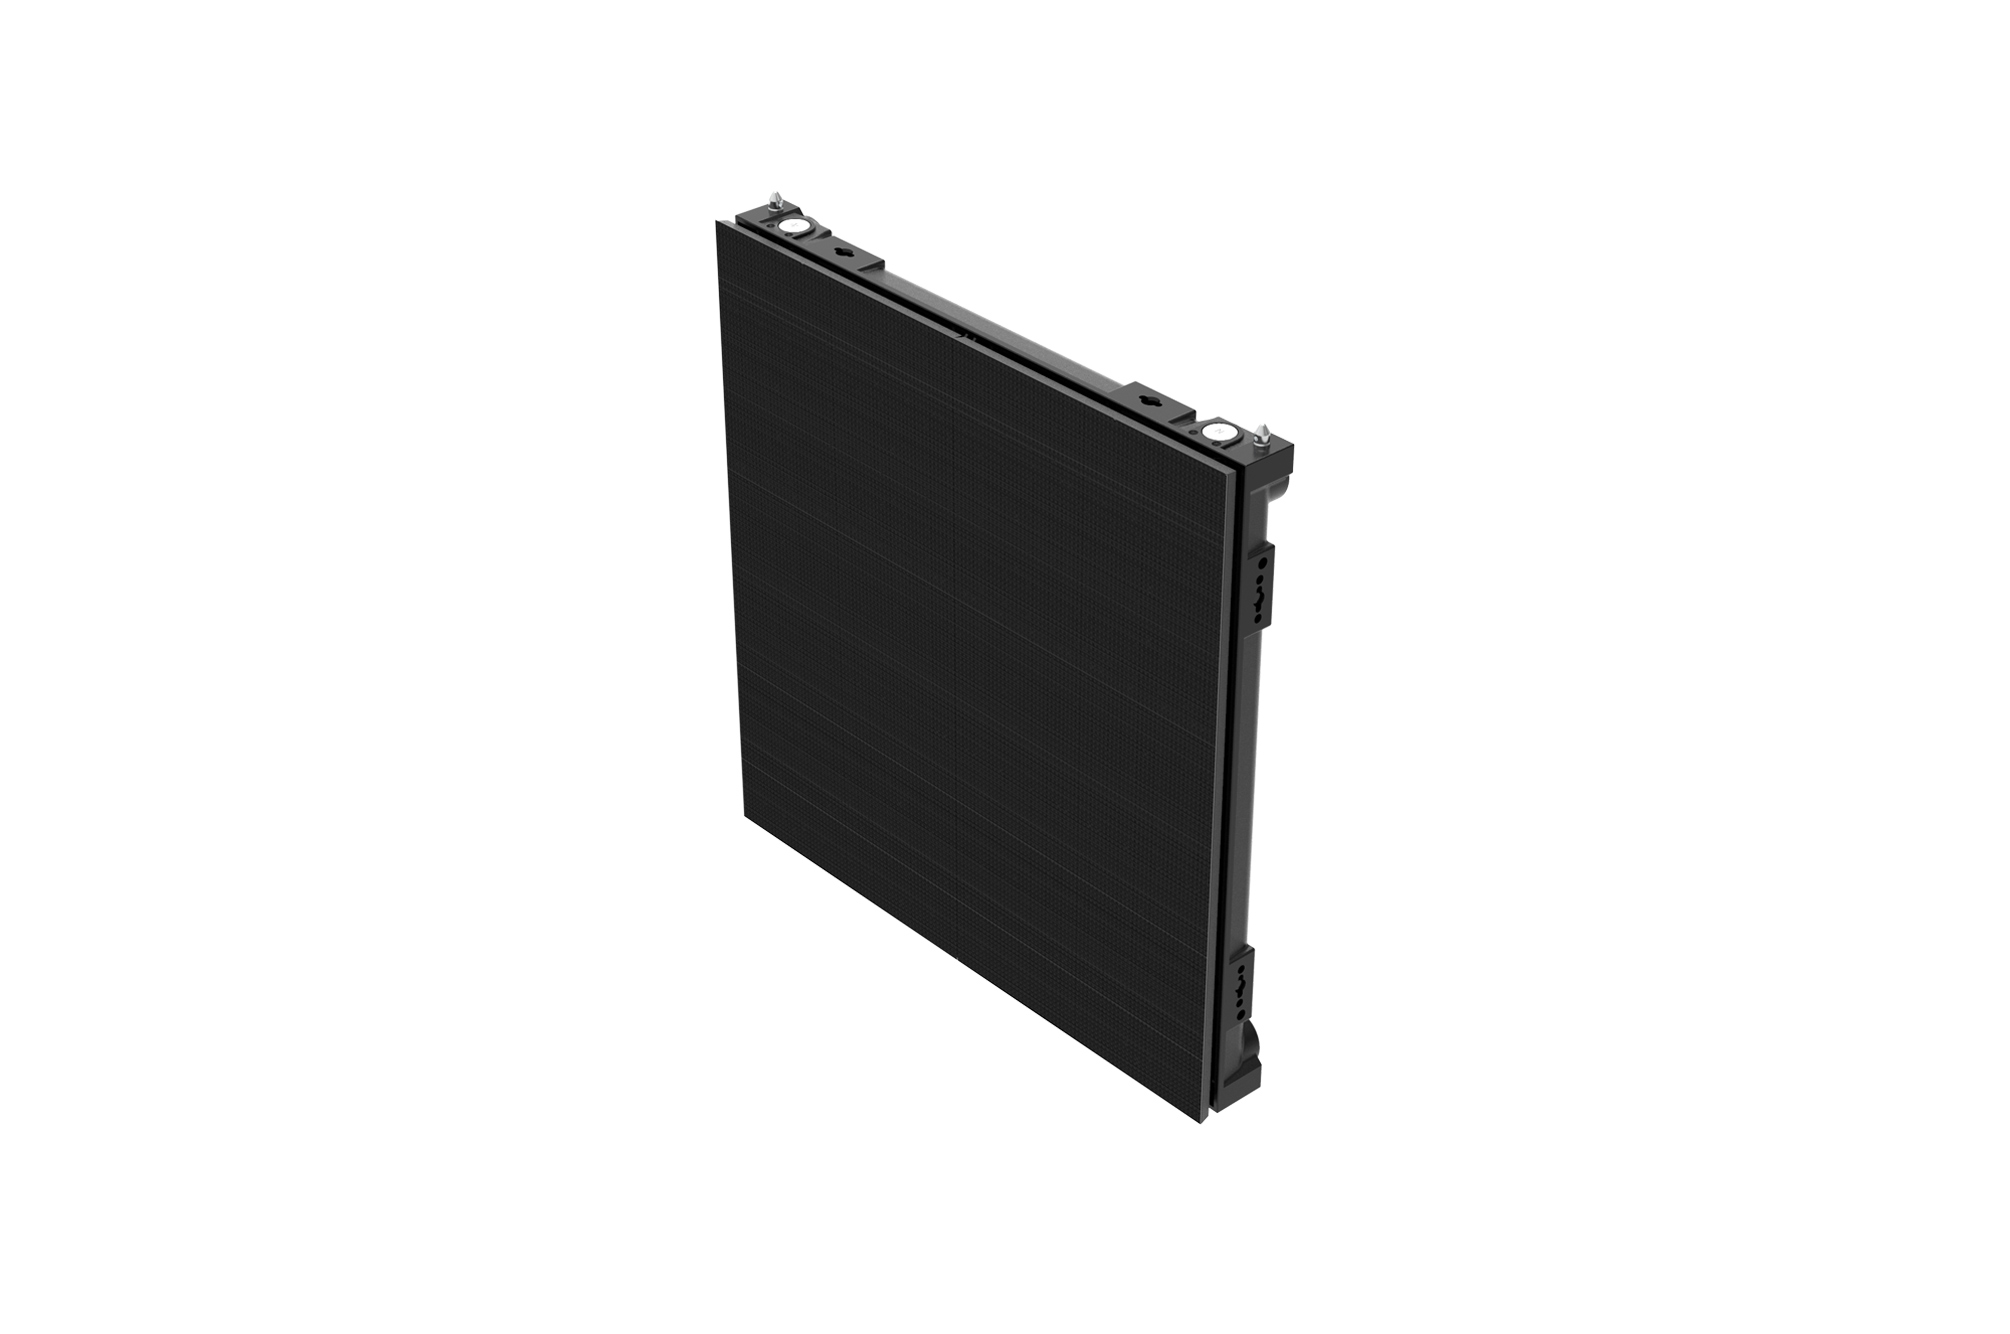 LG Versatile GSCA046